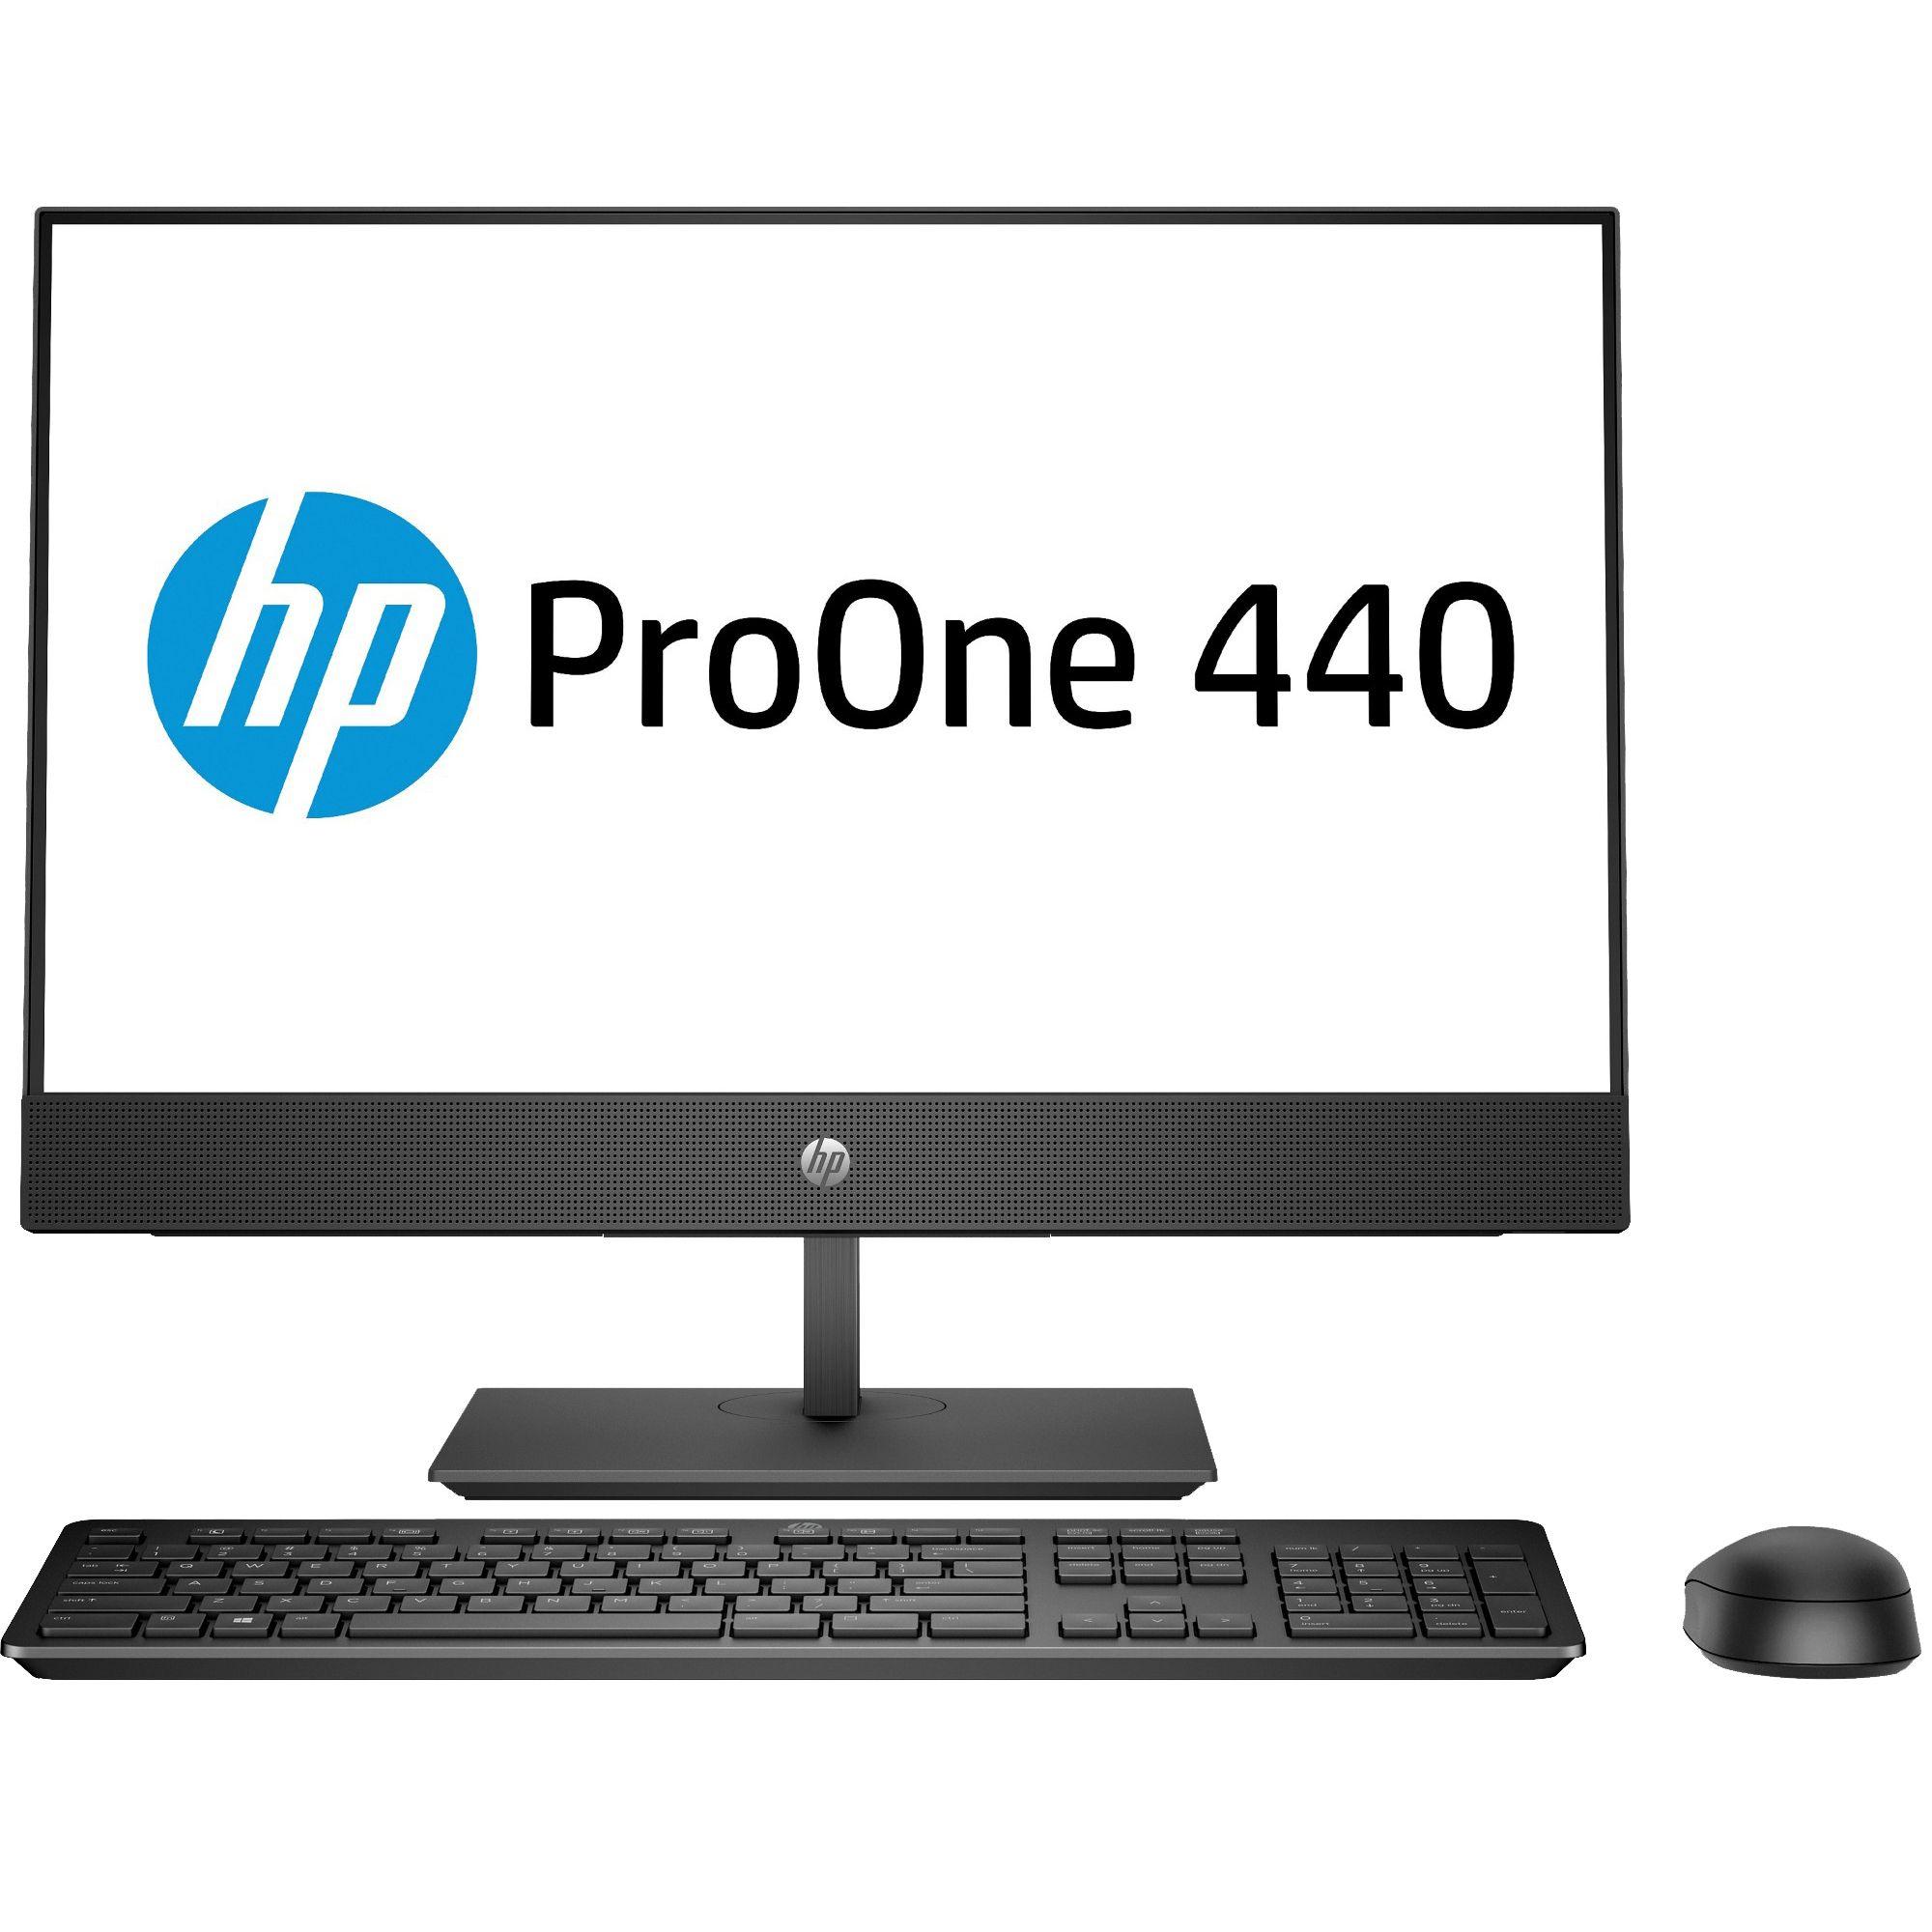 Sistem All-In-One HP ProOne 440 G4 23.8 Full HD Intel Core i5-8500T RAM 8GB SSD 256GB FreeDOS